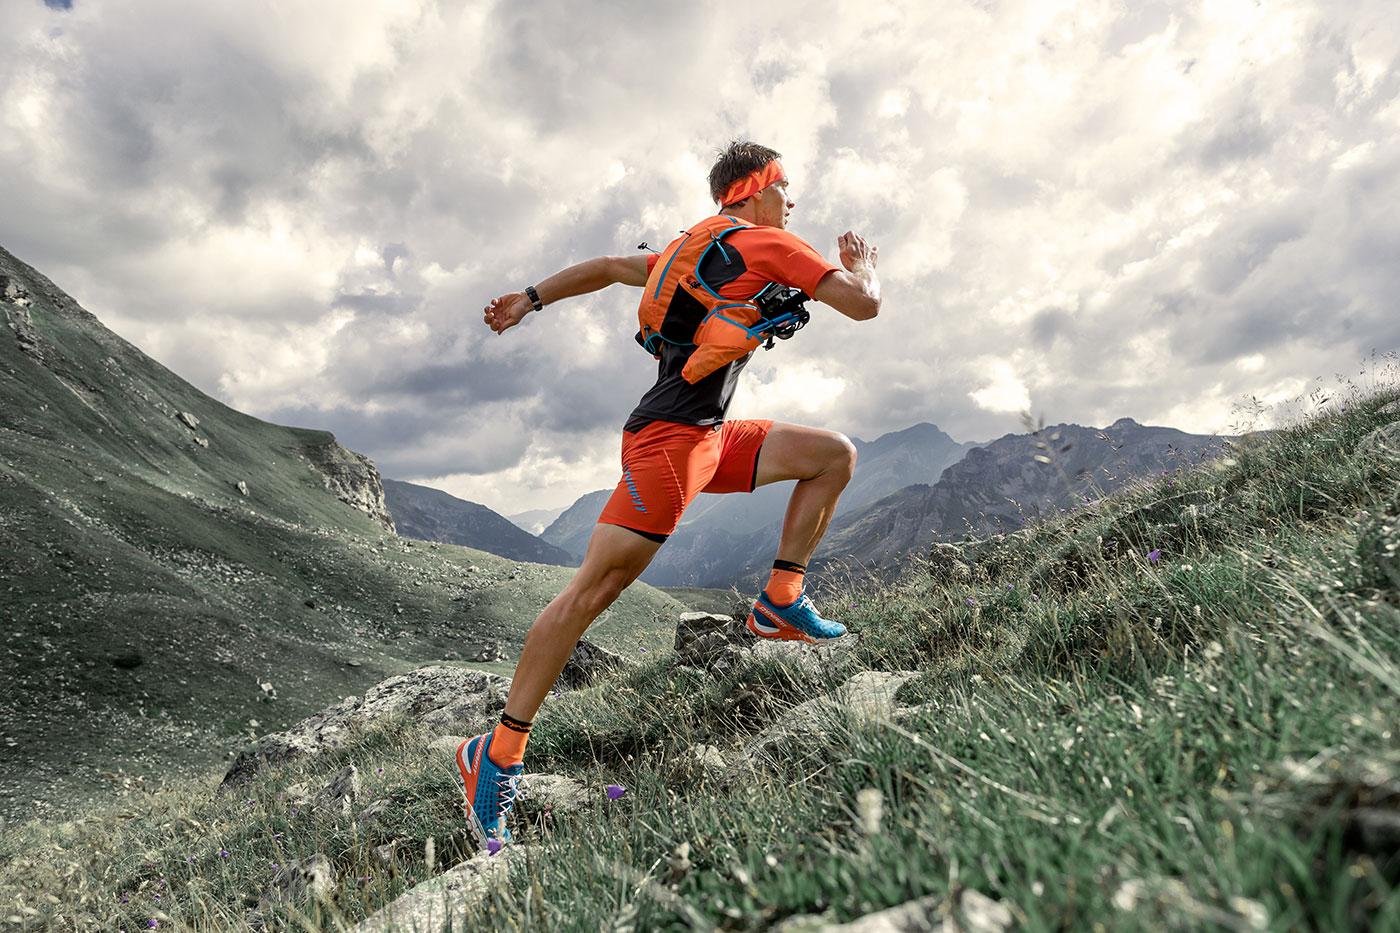 Kletterausrüstung Ausleihen Innsbruck : Salewa · sportgeschäft zillertal mountainshop hörhager